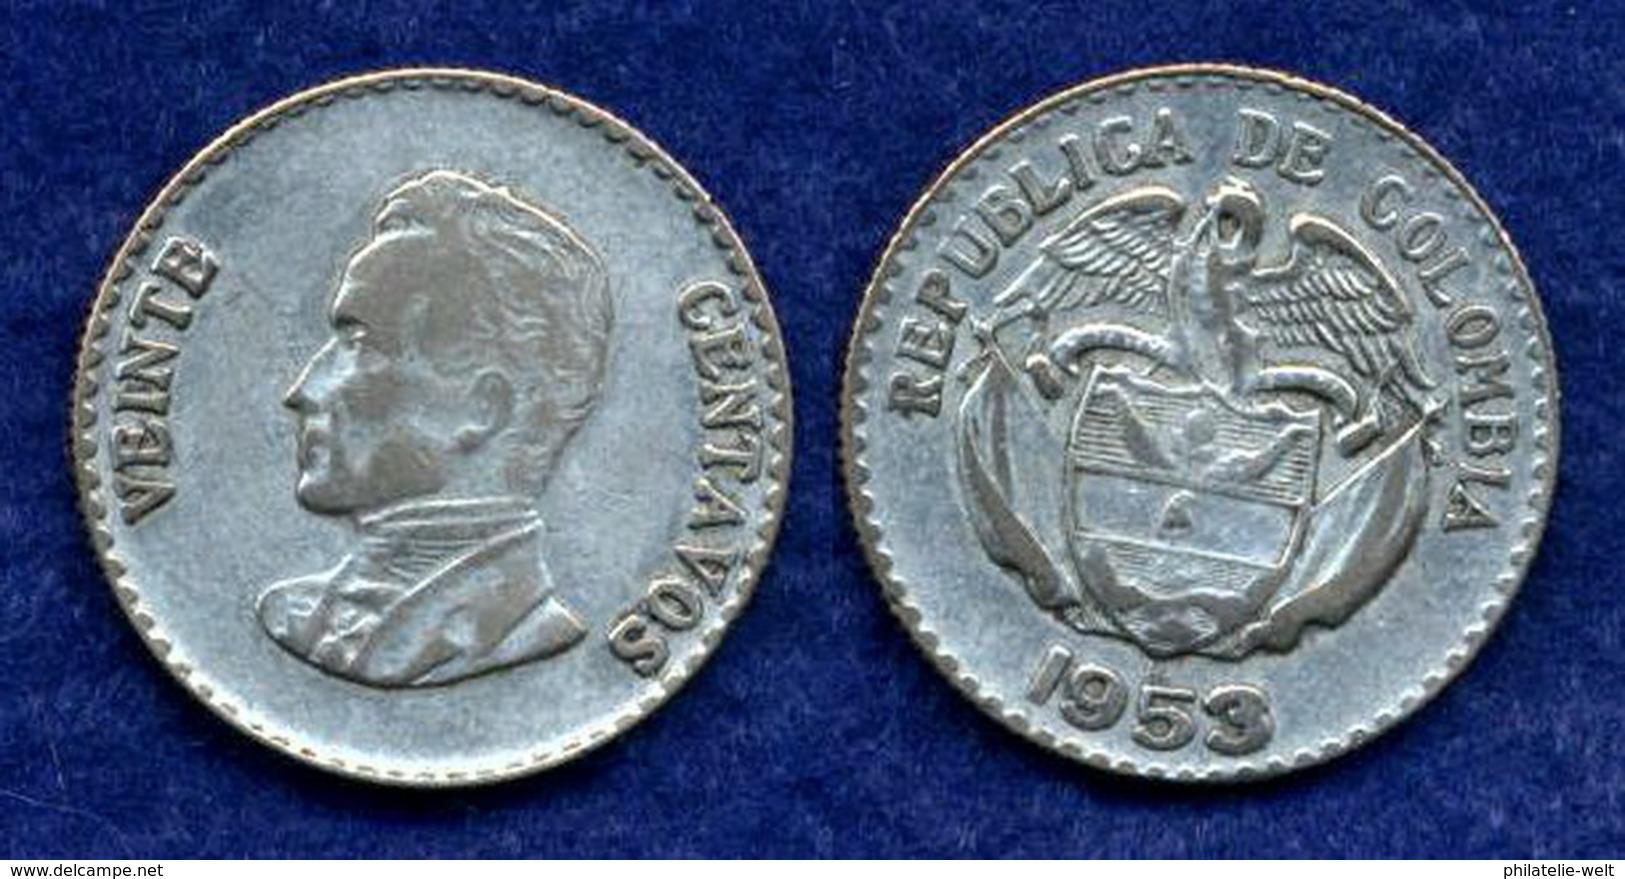 Kolumbien 20 Centavos 1953 Ag300 5g - Kolumbien